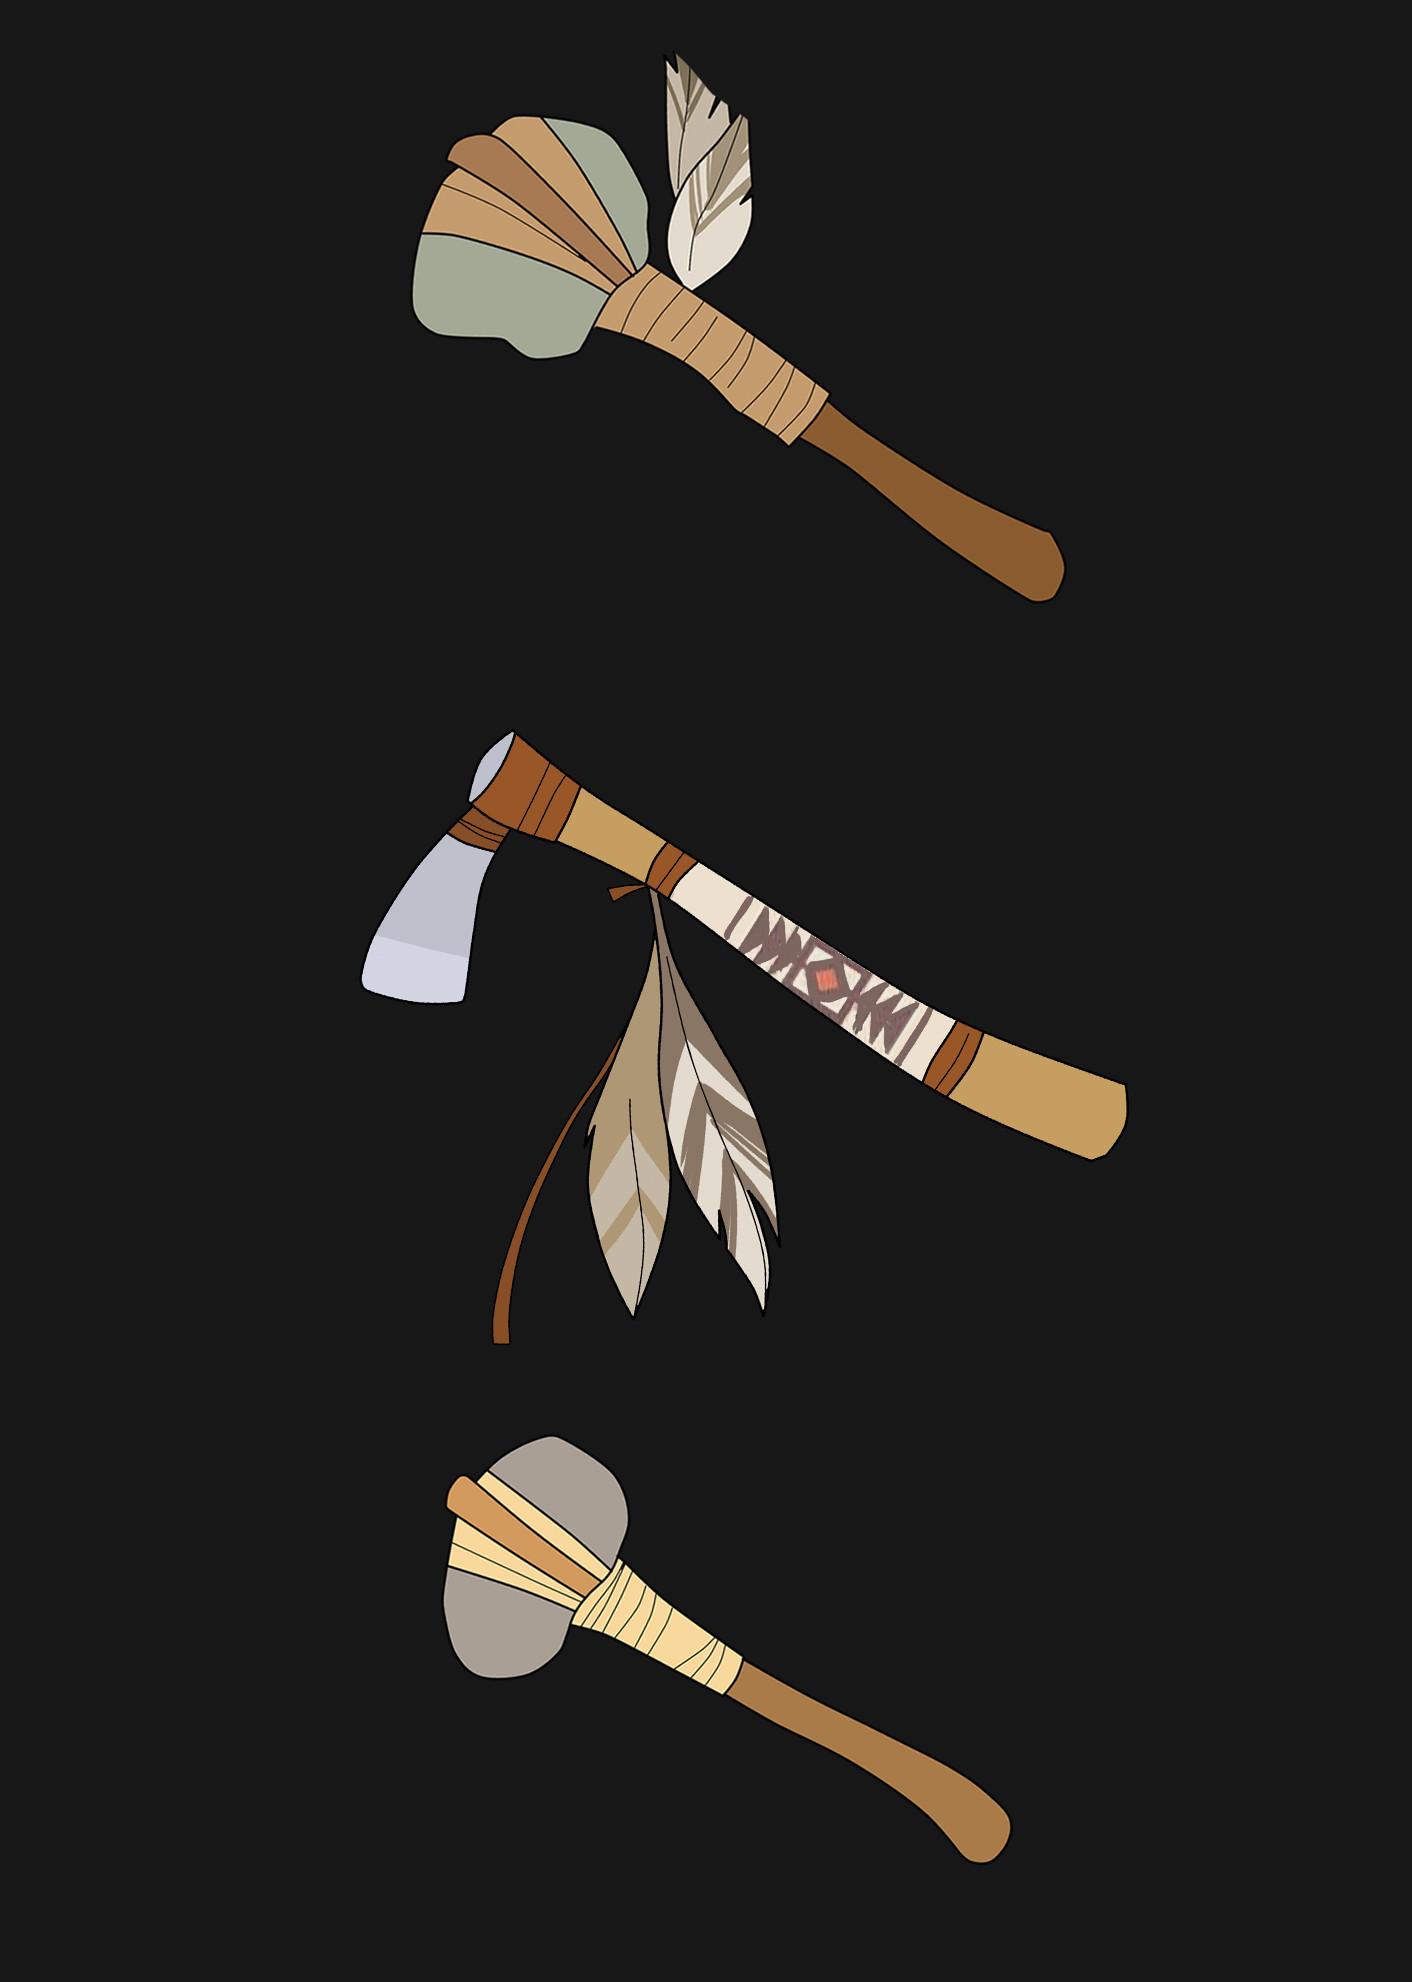 weapon_props2.jpg